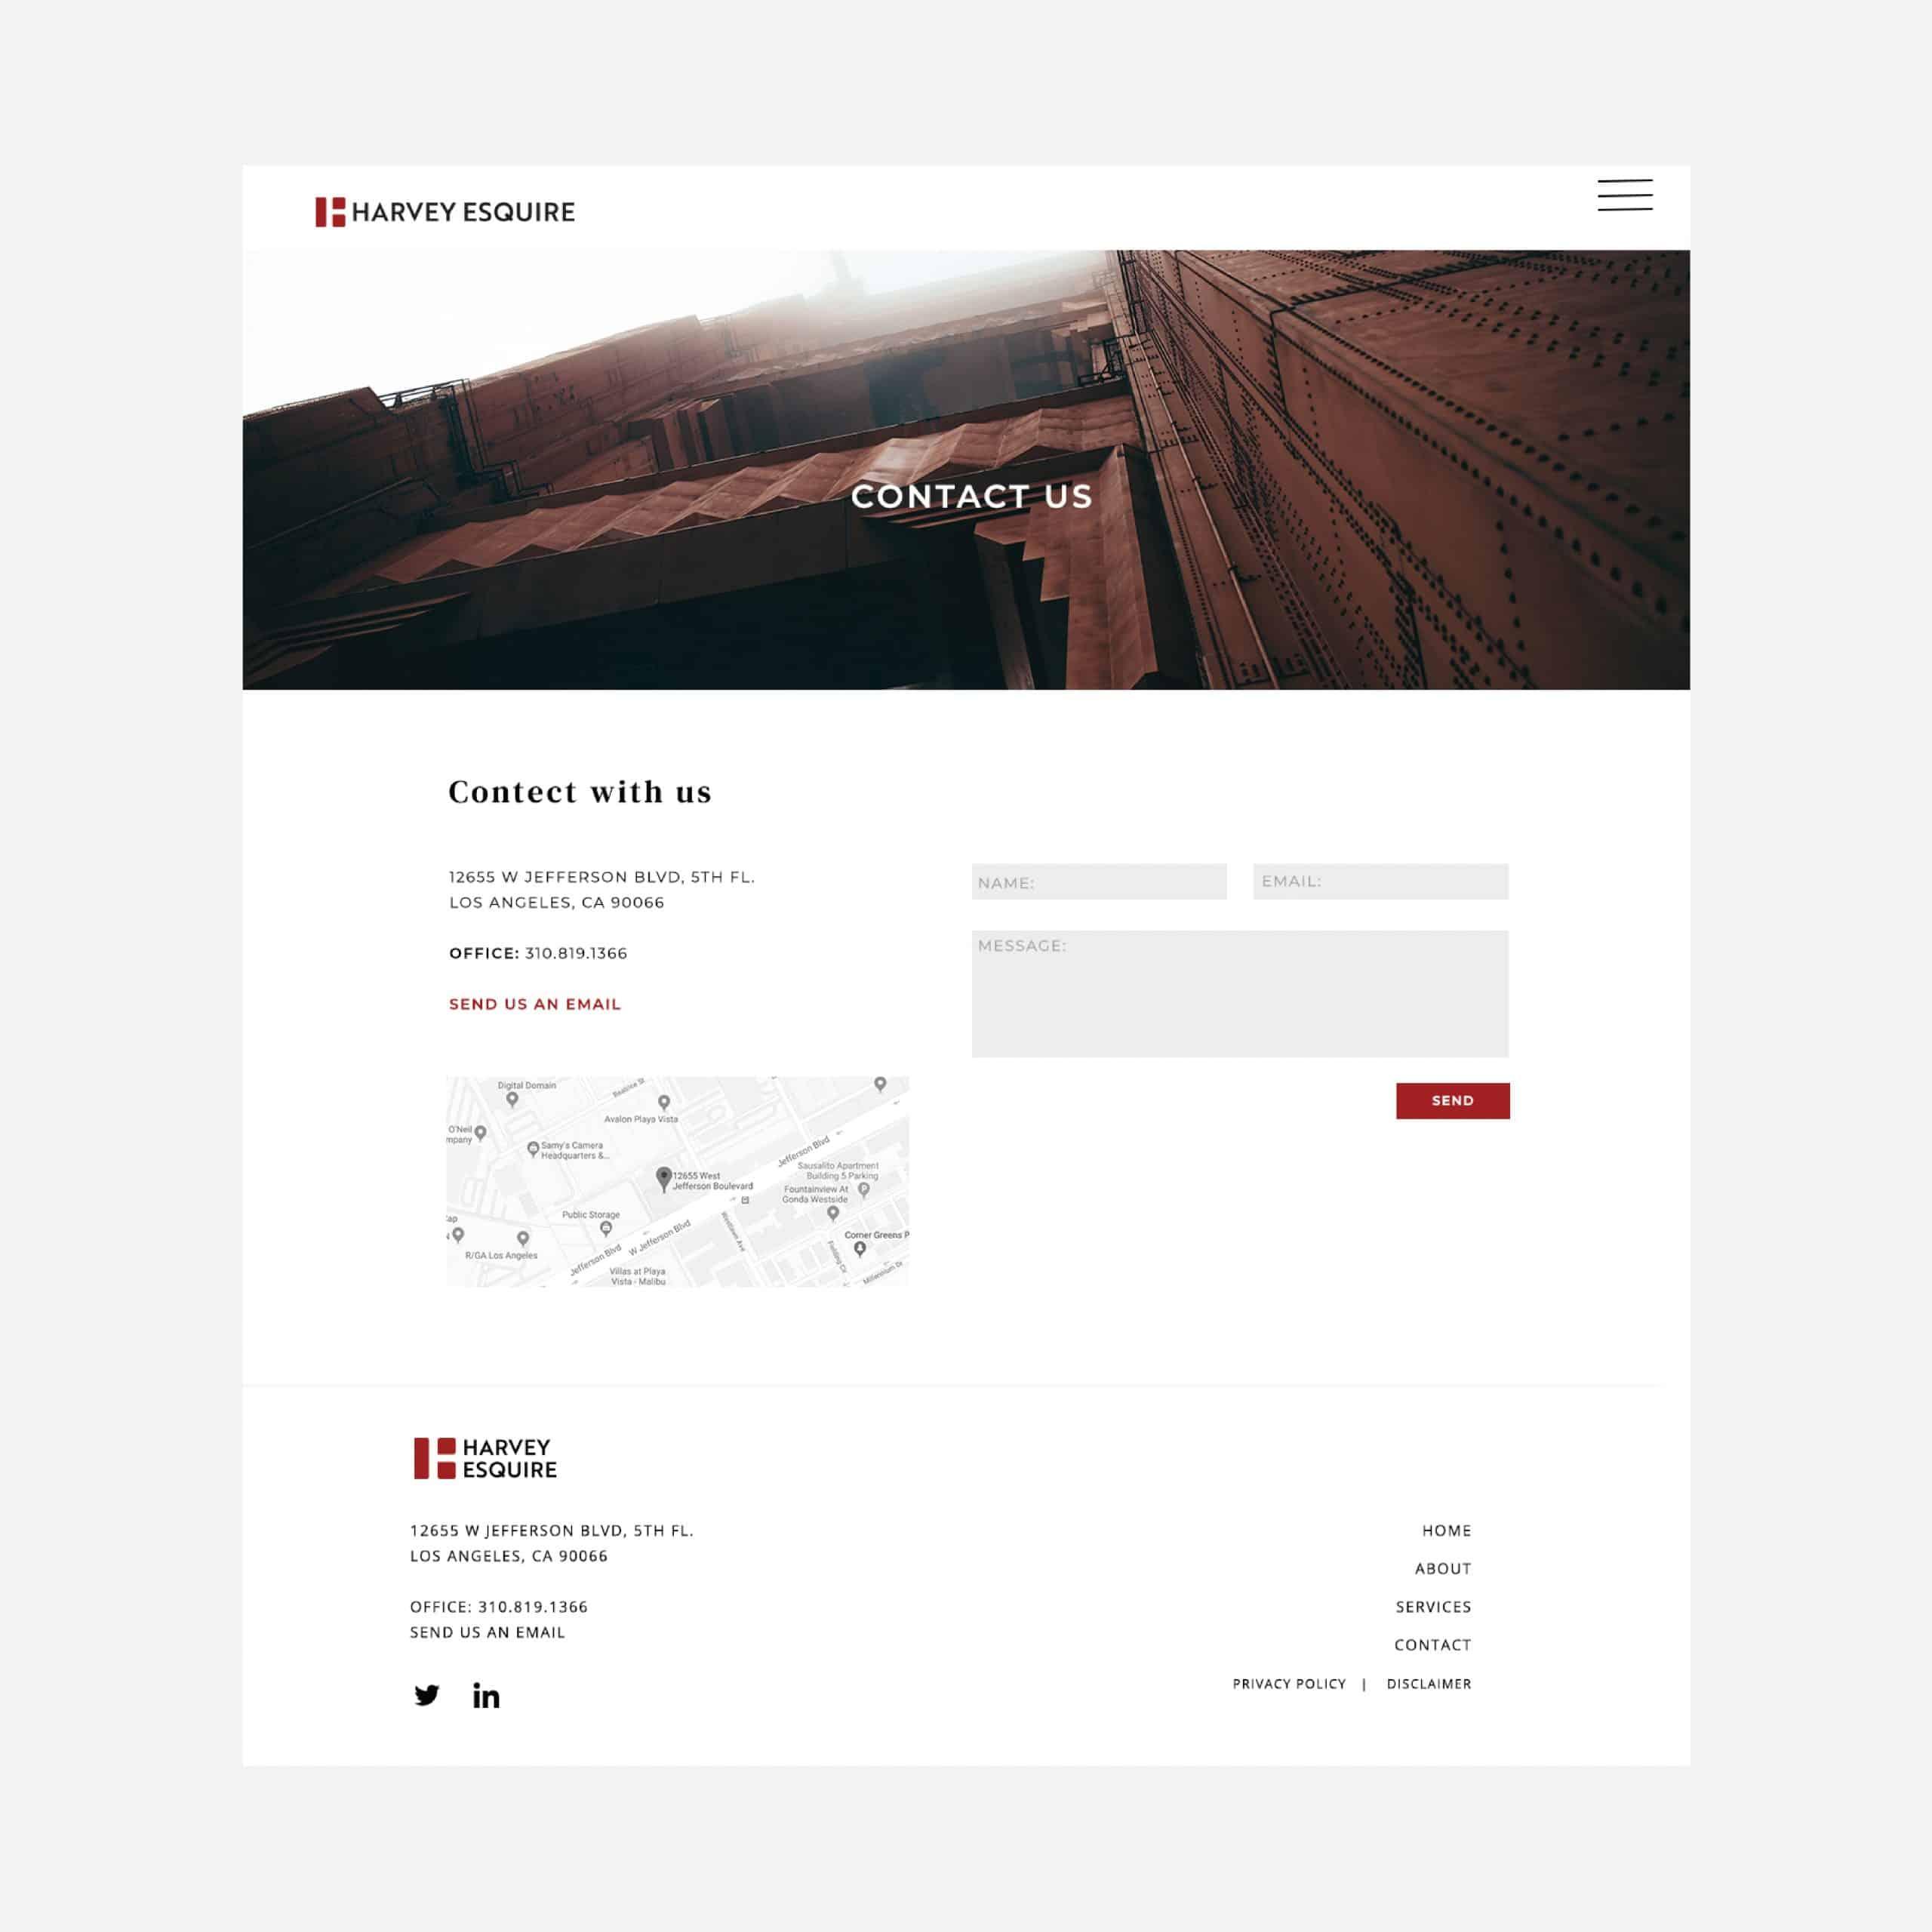 Stellen_Design_Harvey_esquire_Branding-07